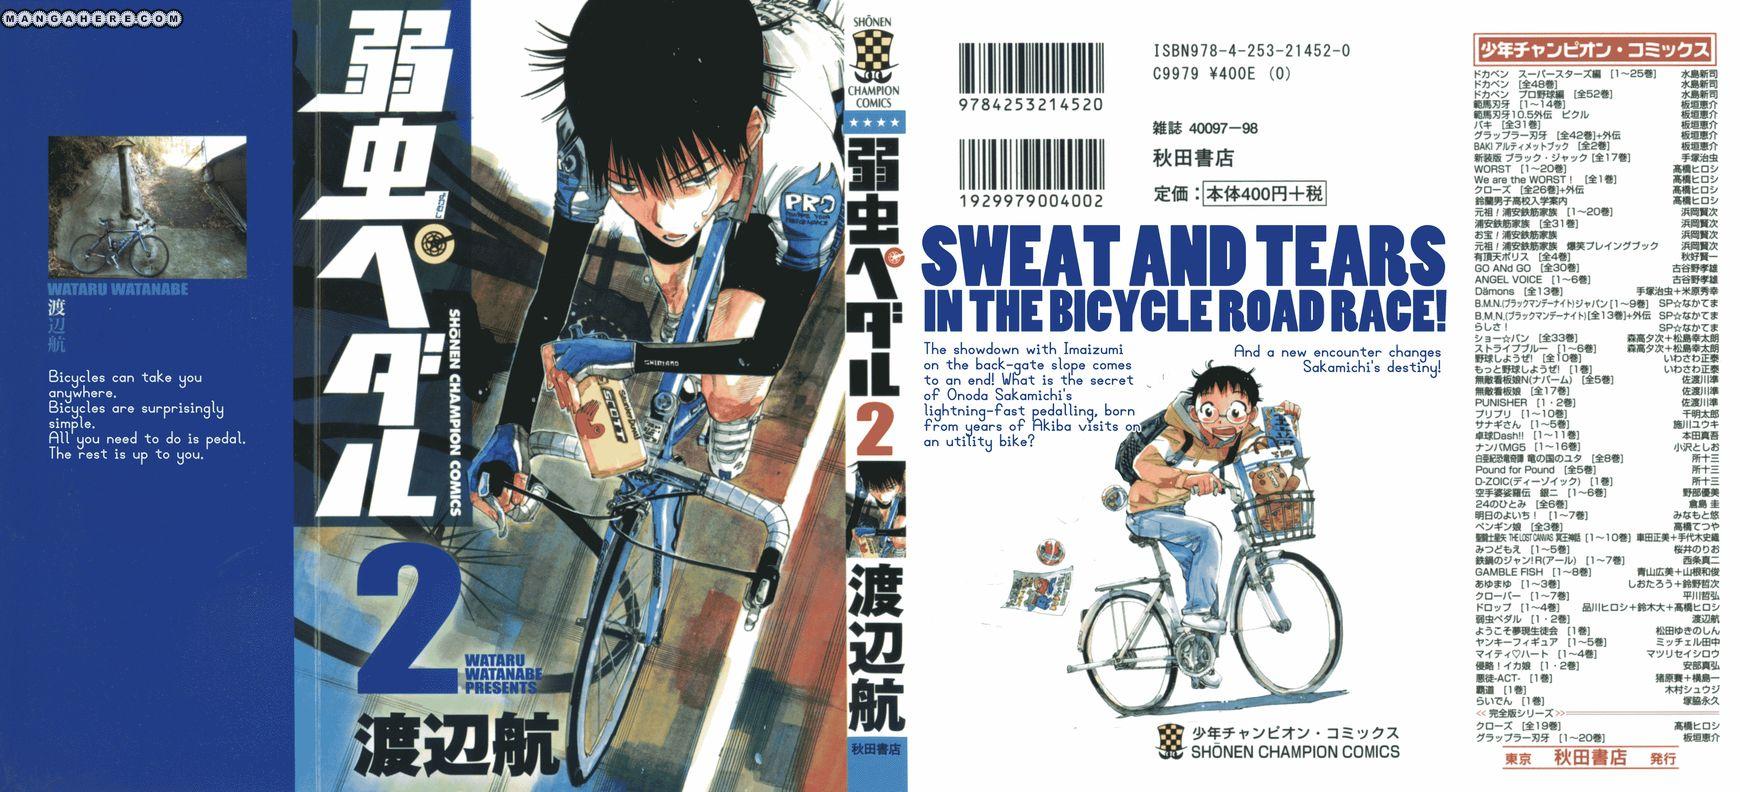 Yowamushi Pedal 8 Page 1